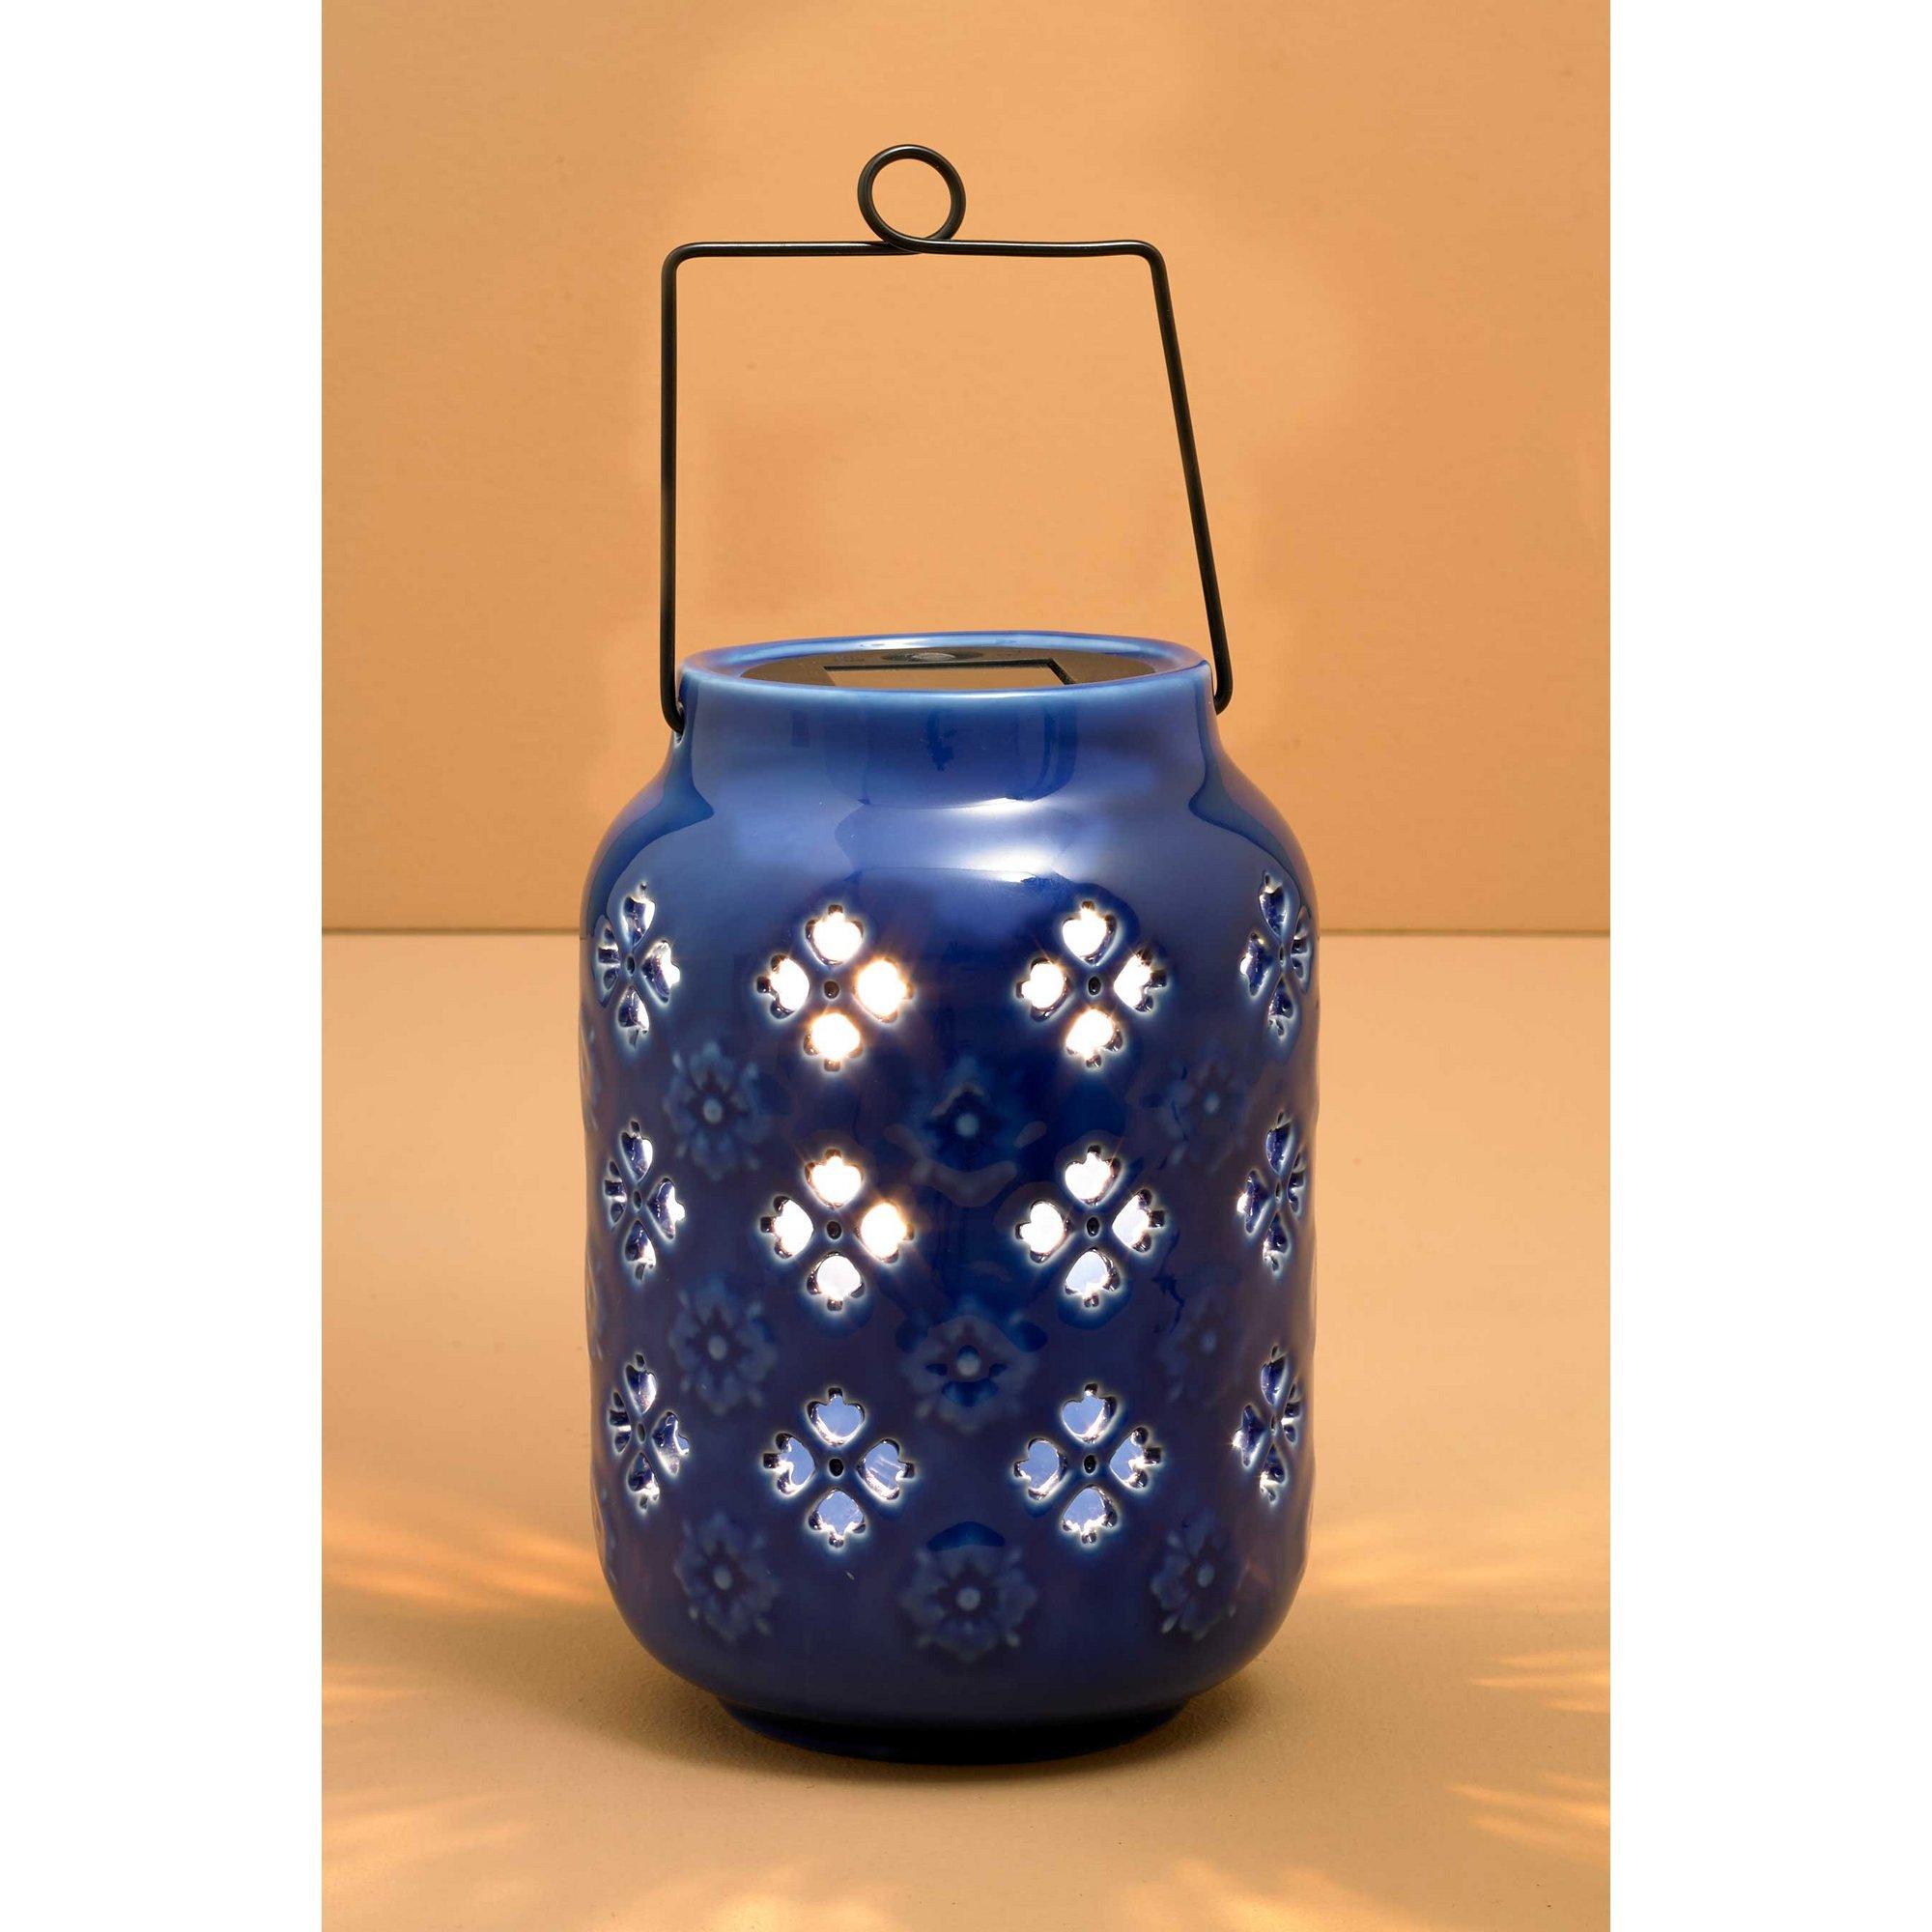 Image of Moroccan Ceramic Solar Lantern